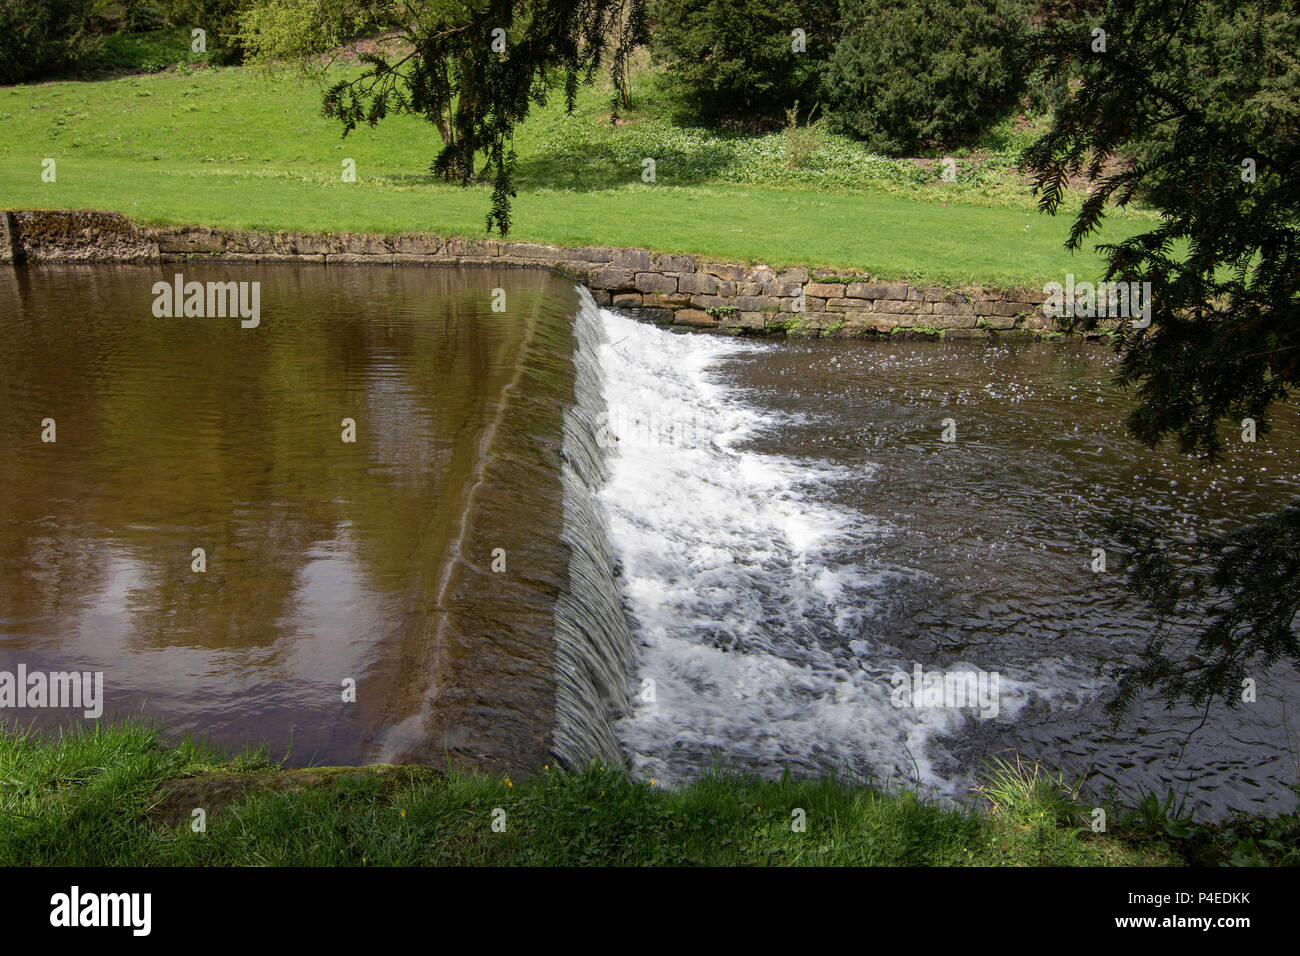 River Skell Weir at Studley Royal,Ripon,North Yorkshire,England,UK. - Stock Image